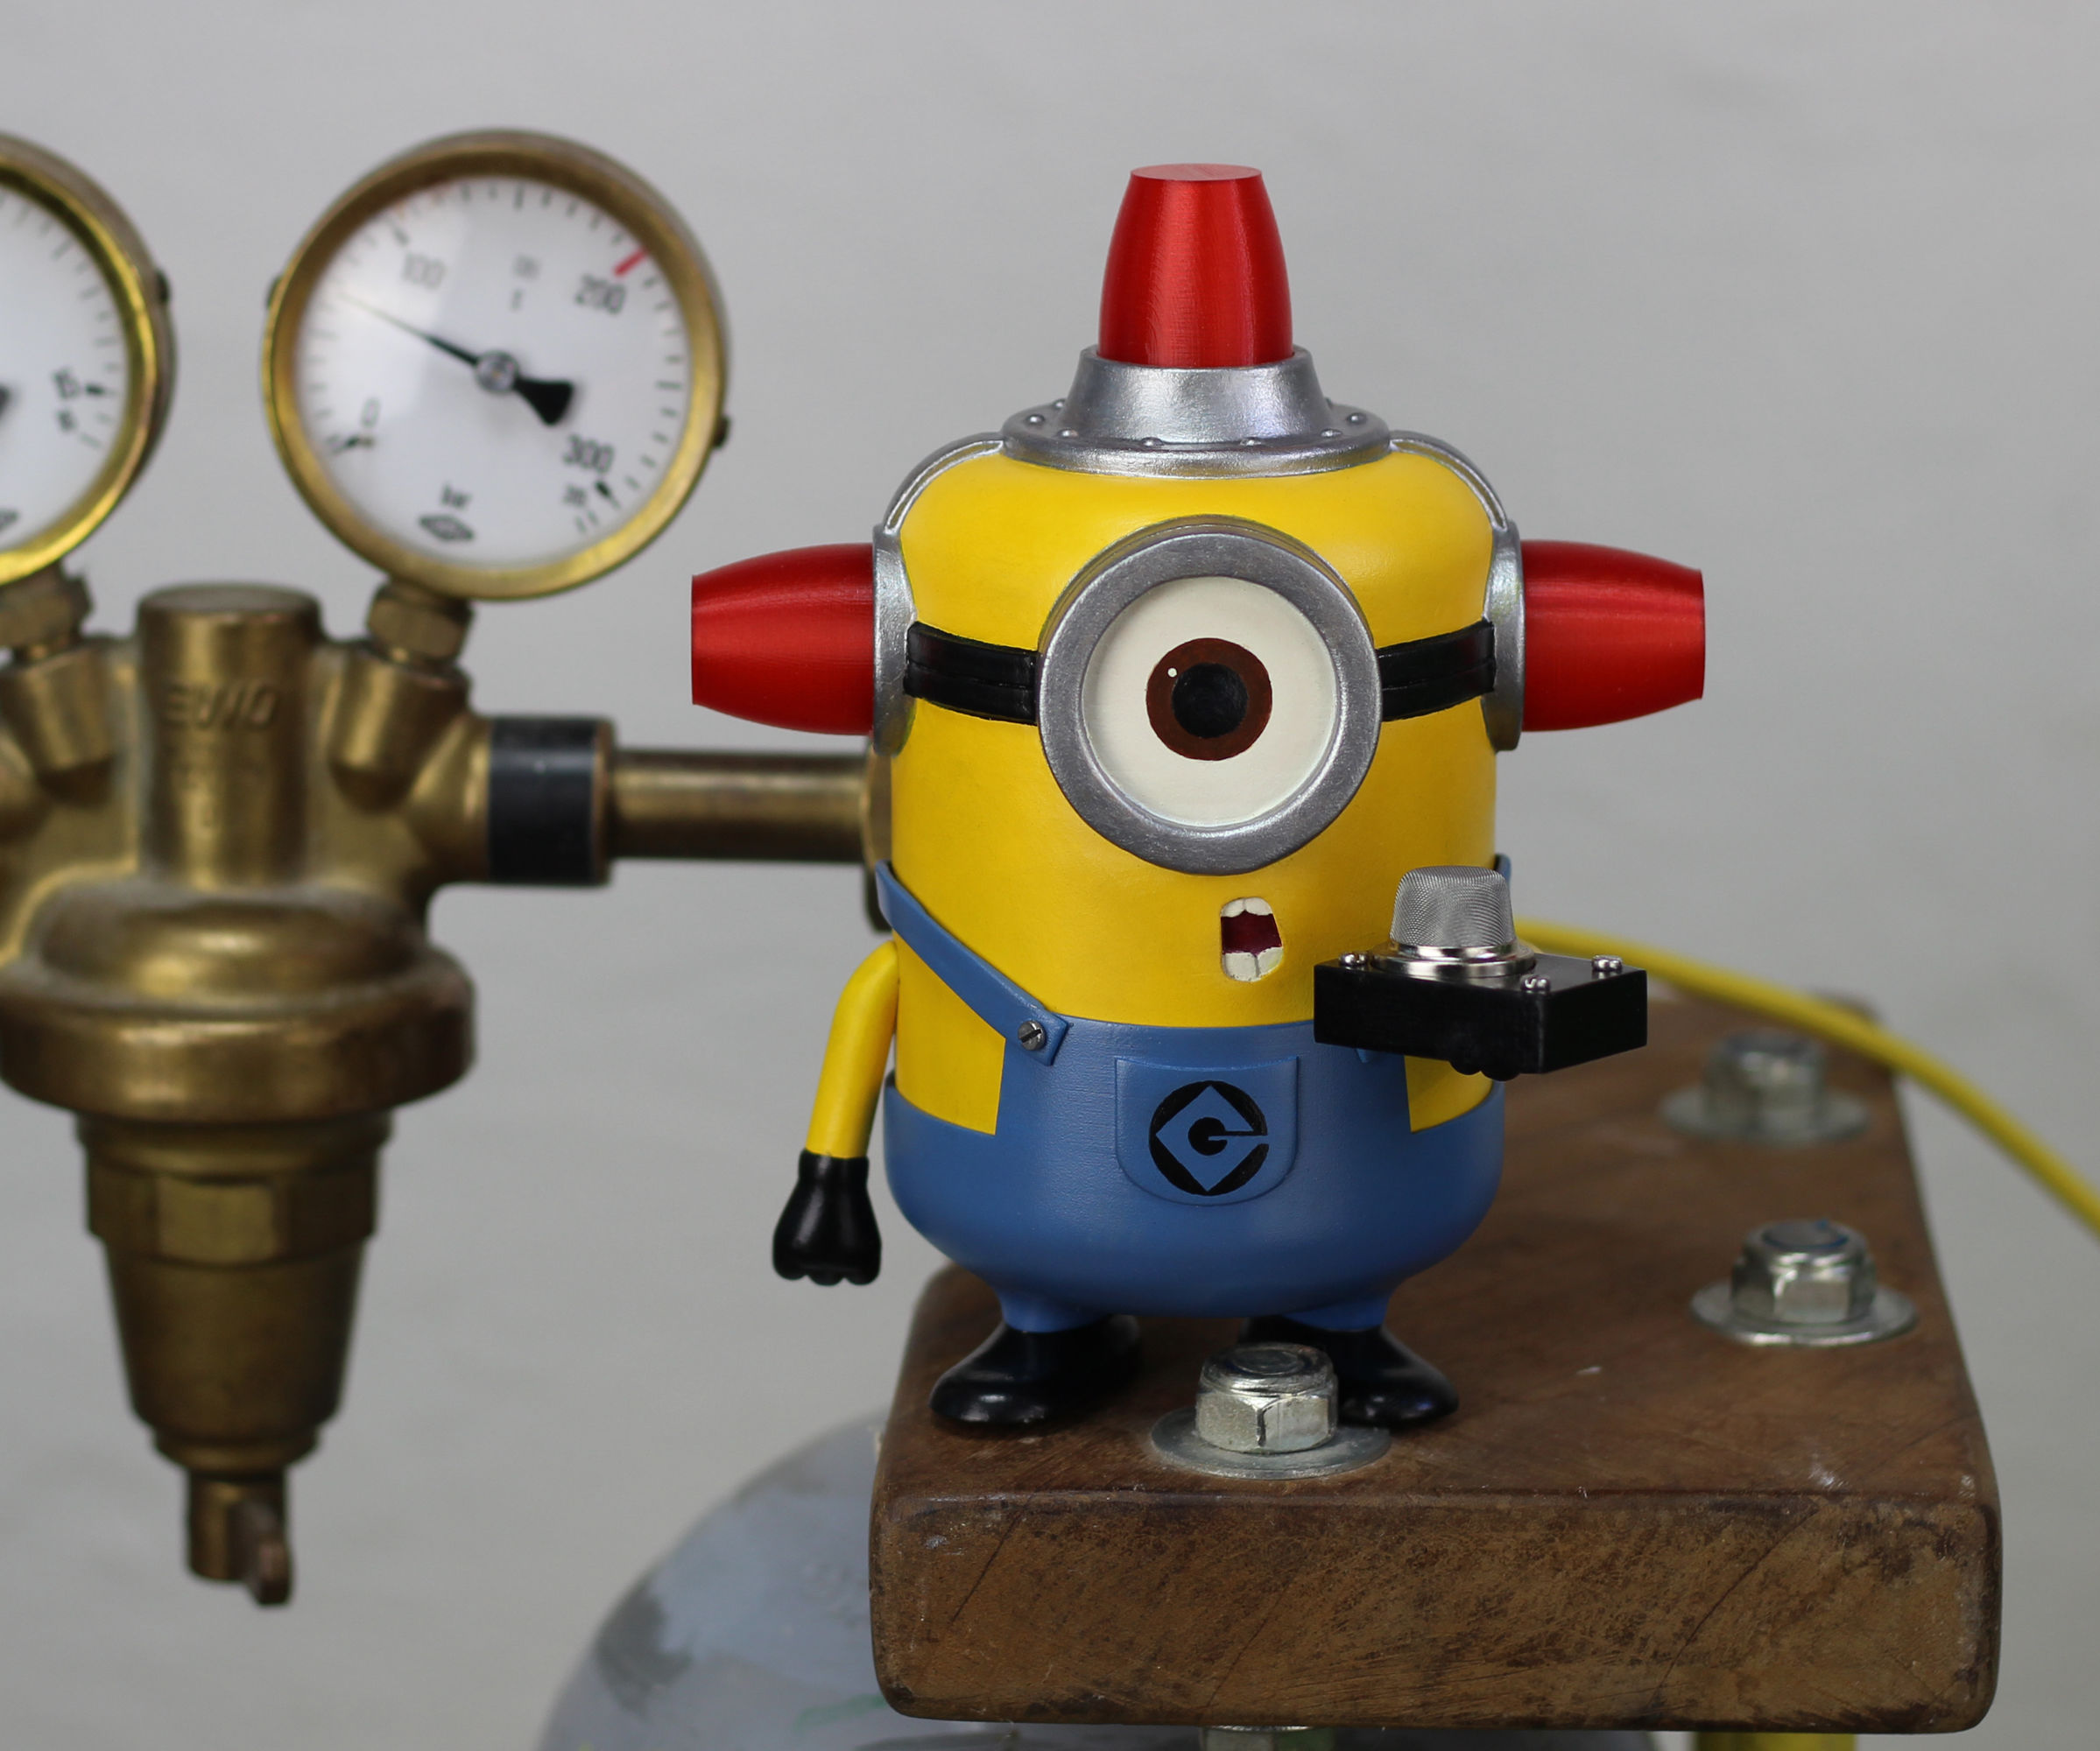 Minion Fart and Smoke Alarm